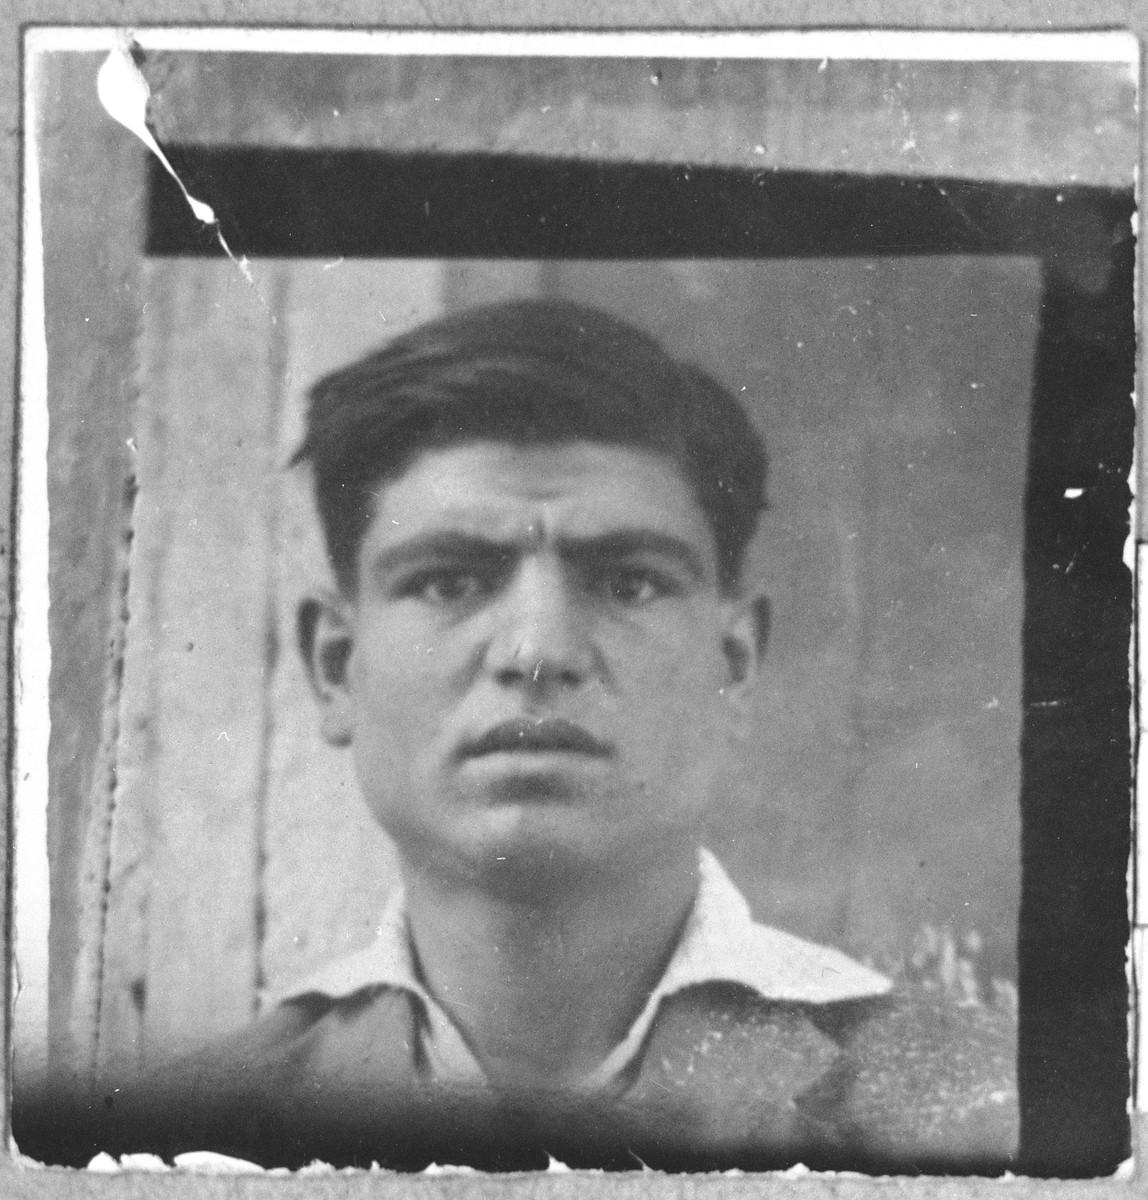 Portrait of David Koen, son of Aron Koen.  He was a carpenter.  He lived at Karagoryeva 75 in Bitola.